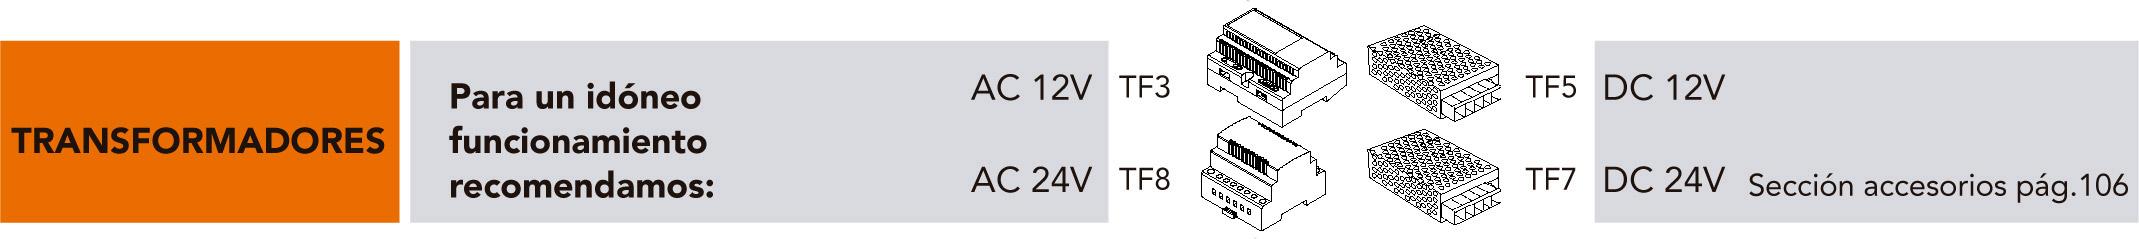 S83_transformadores